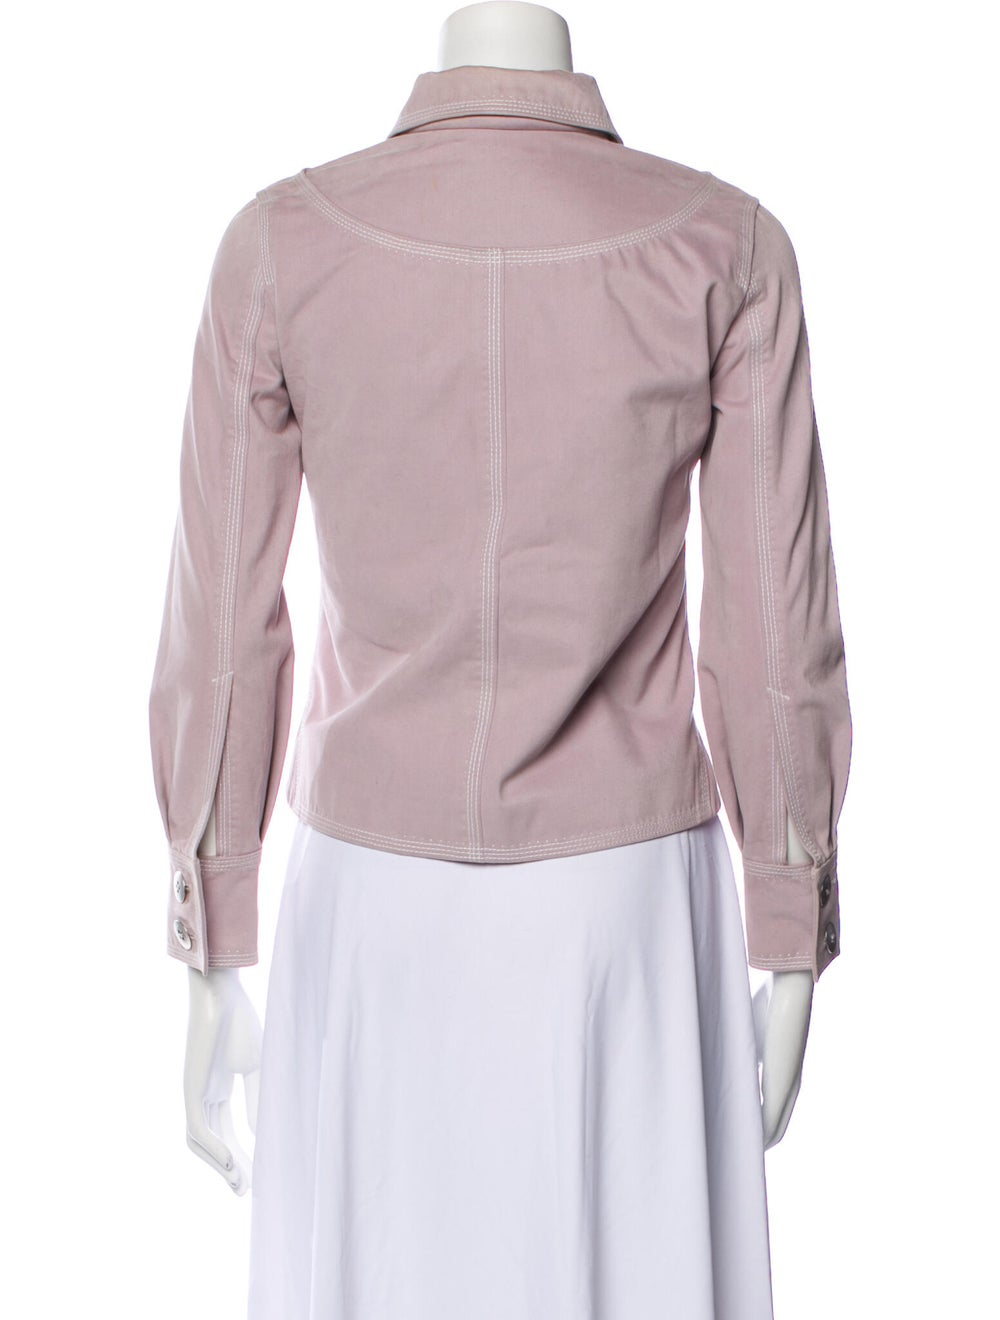 Louis Vuitton Denim Jacket Denim - image 3